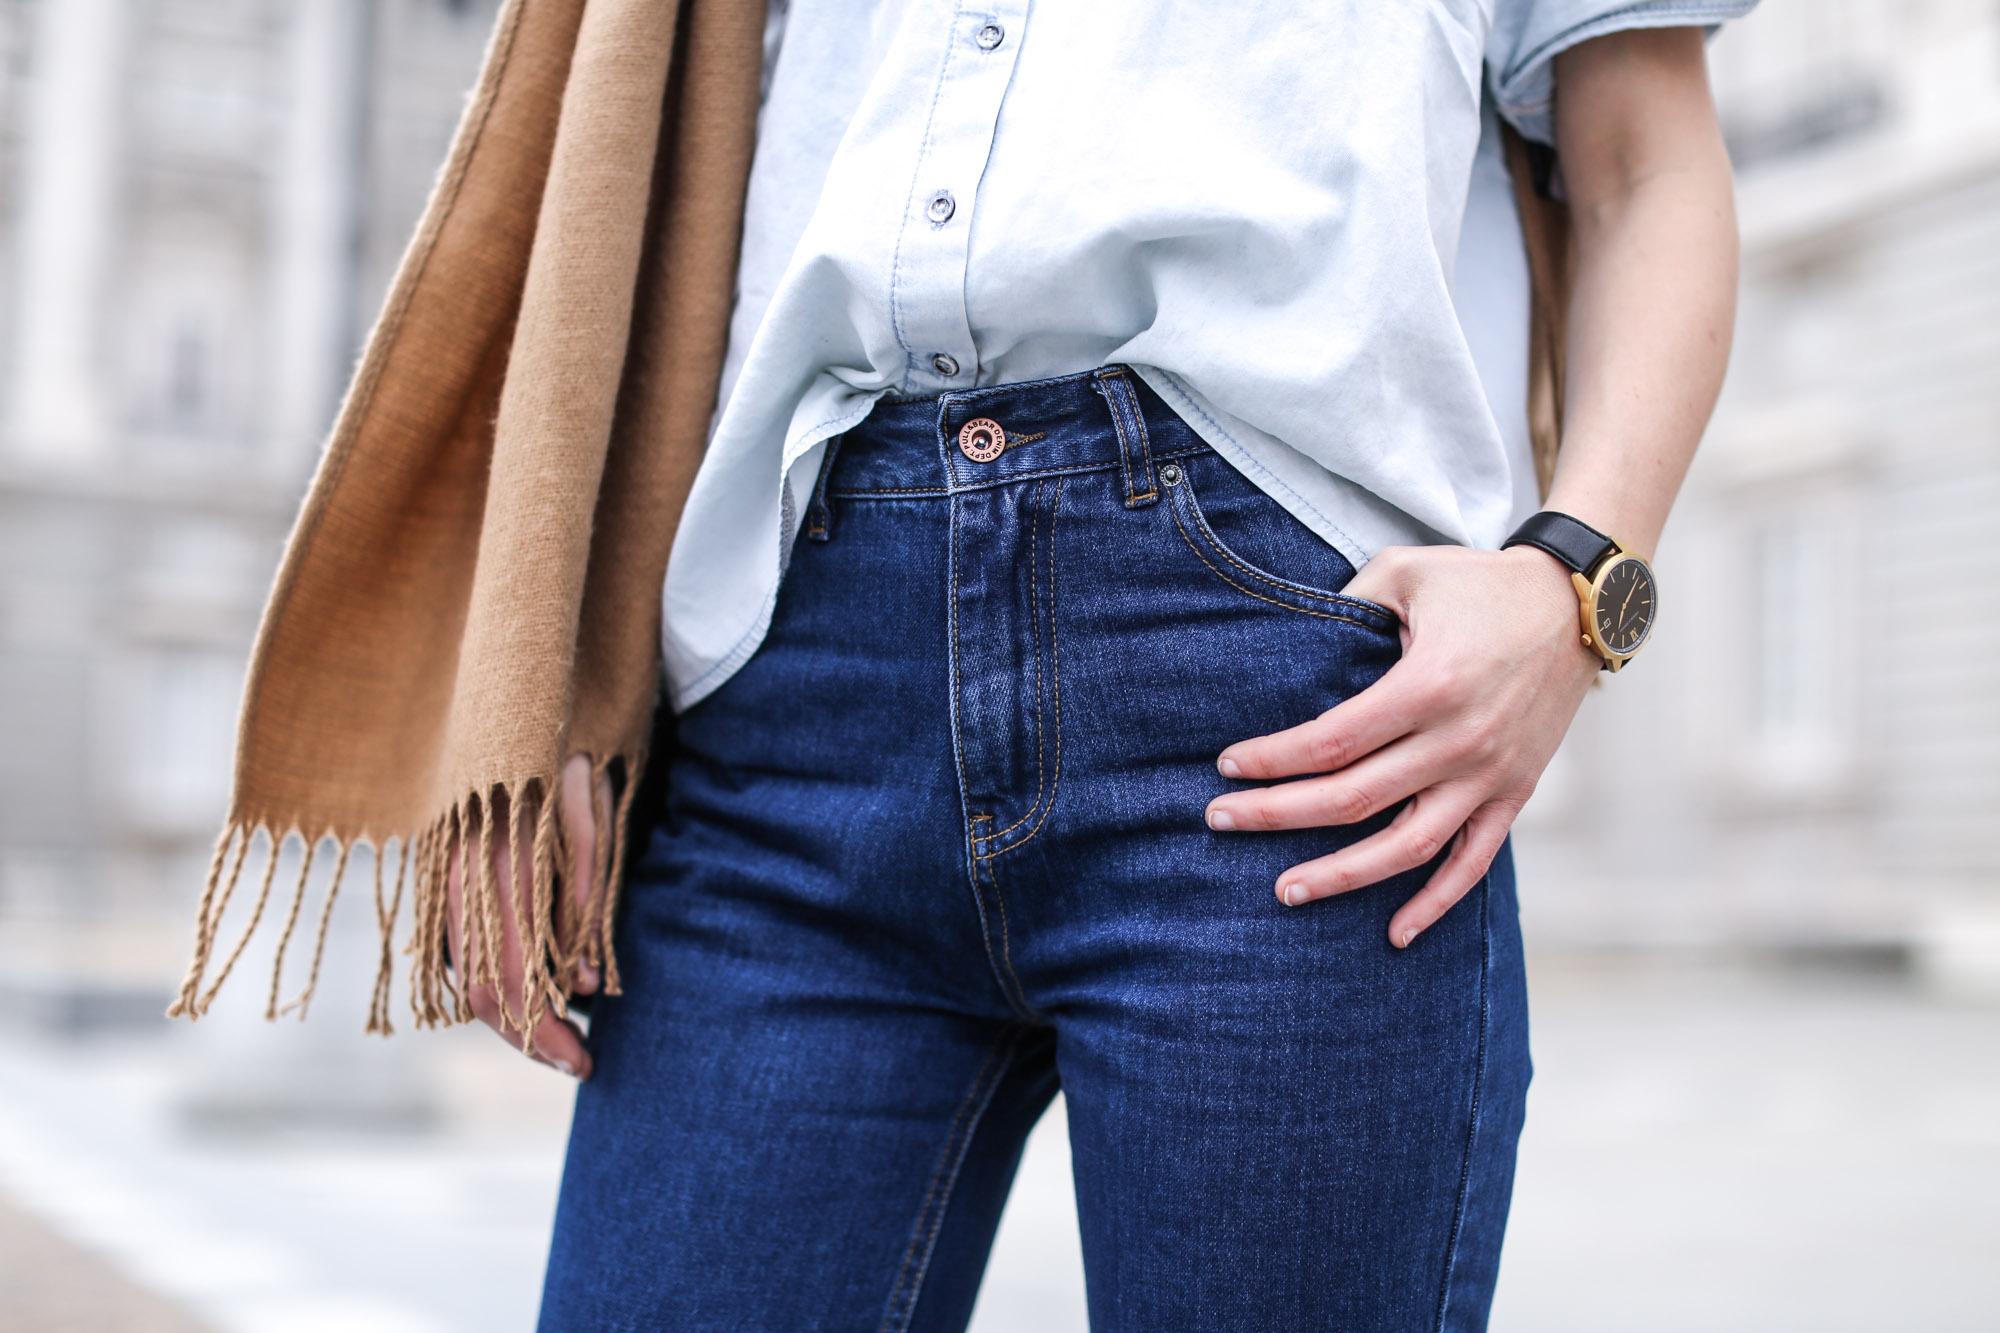 Clochet-mango-flurry-coat-mum-jeans-adidas-gazelle-10